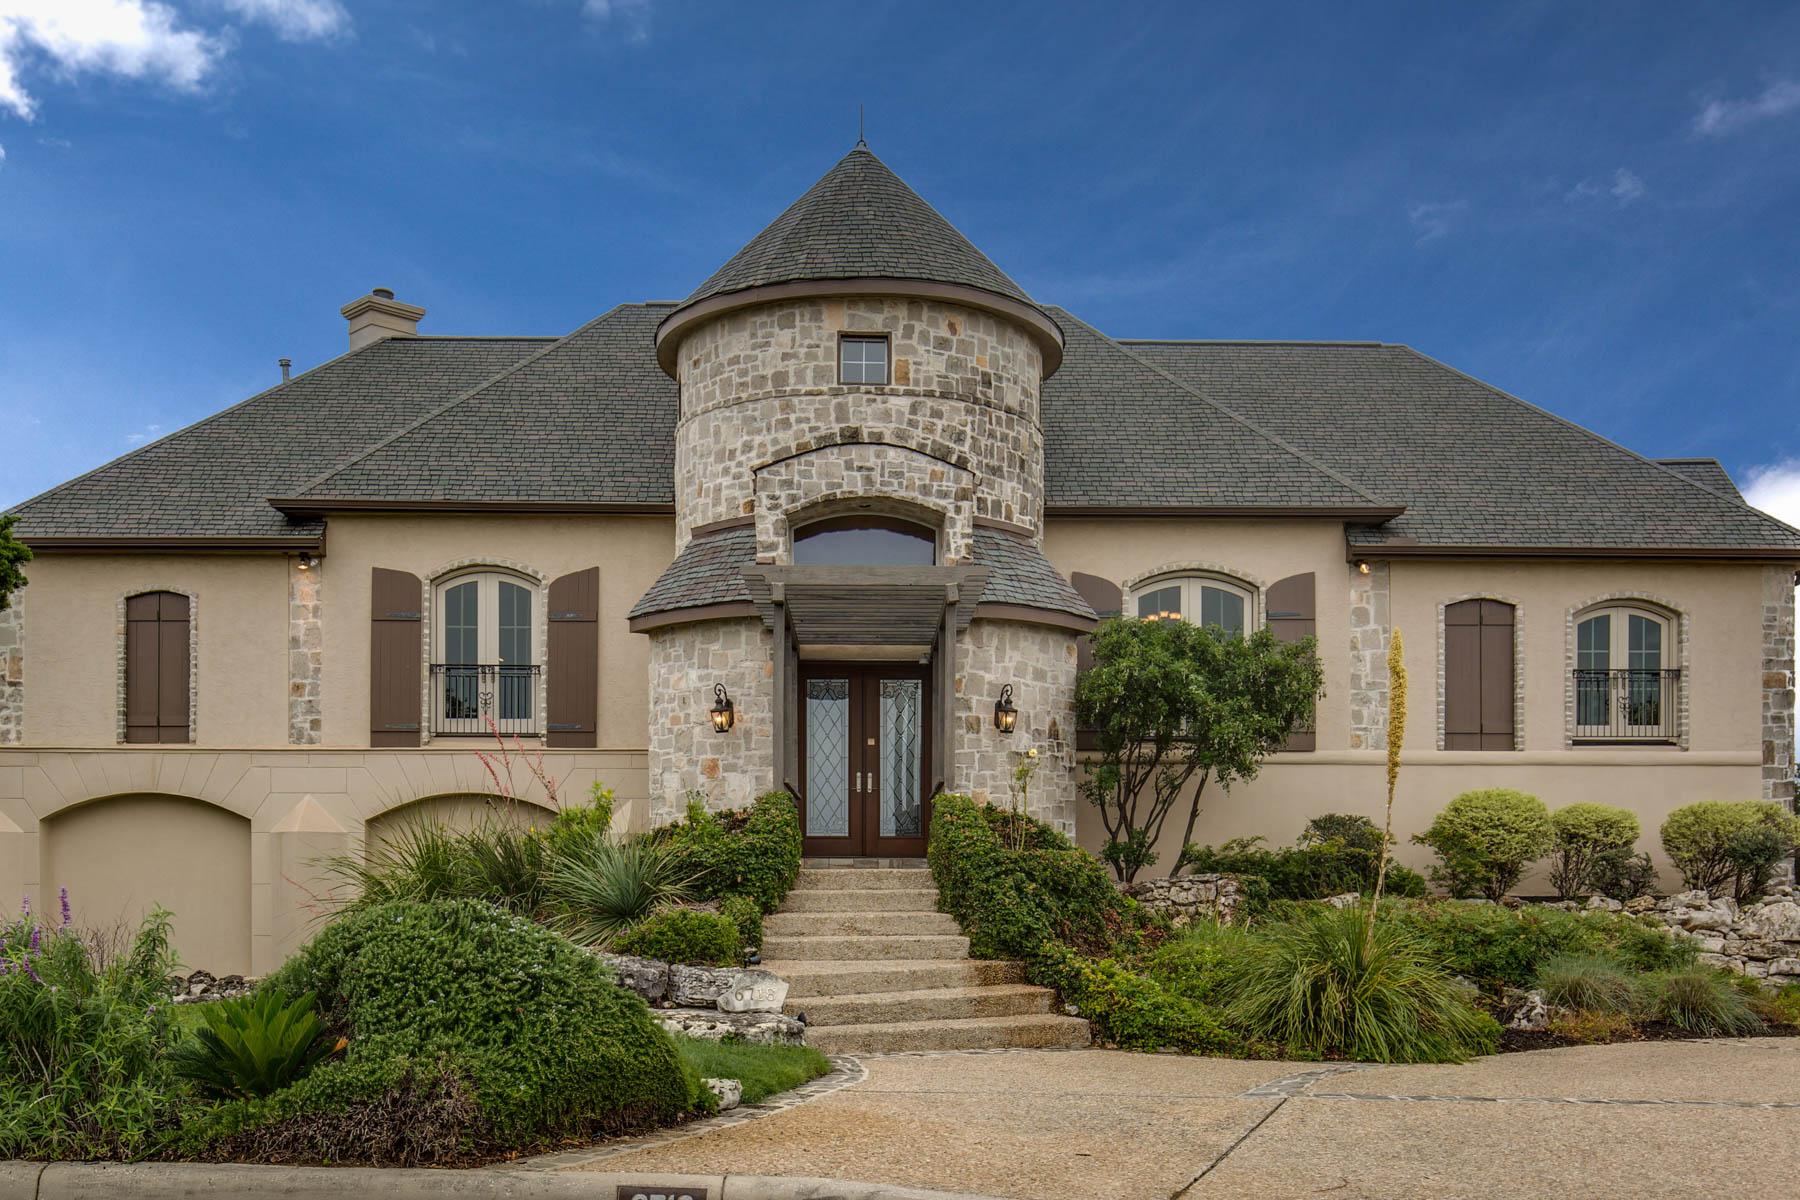 Single Family Home for Sale at Breathtaking Estate in Crownridge 6718 Wagner Way Crownridge, San Antonio, Texas, 78256 United States